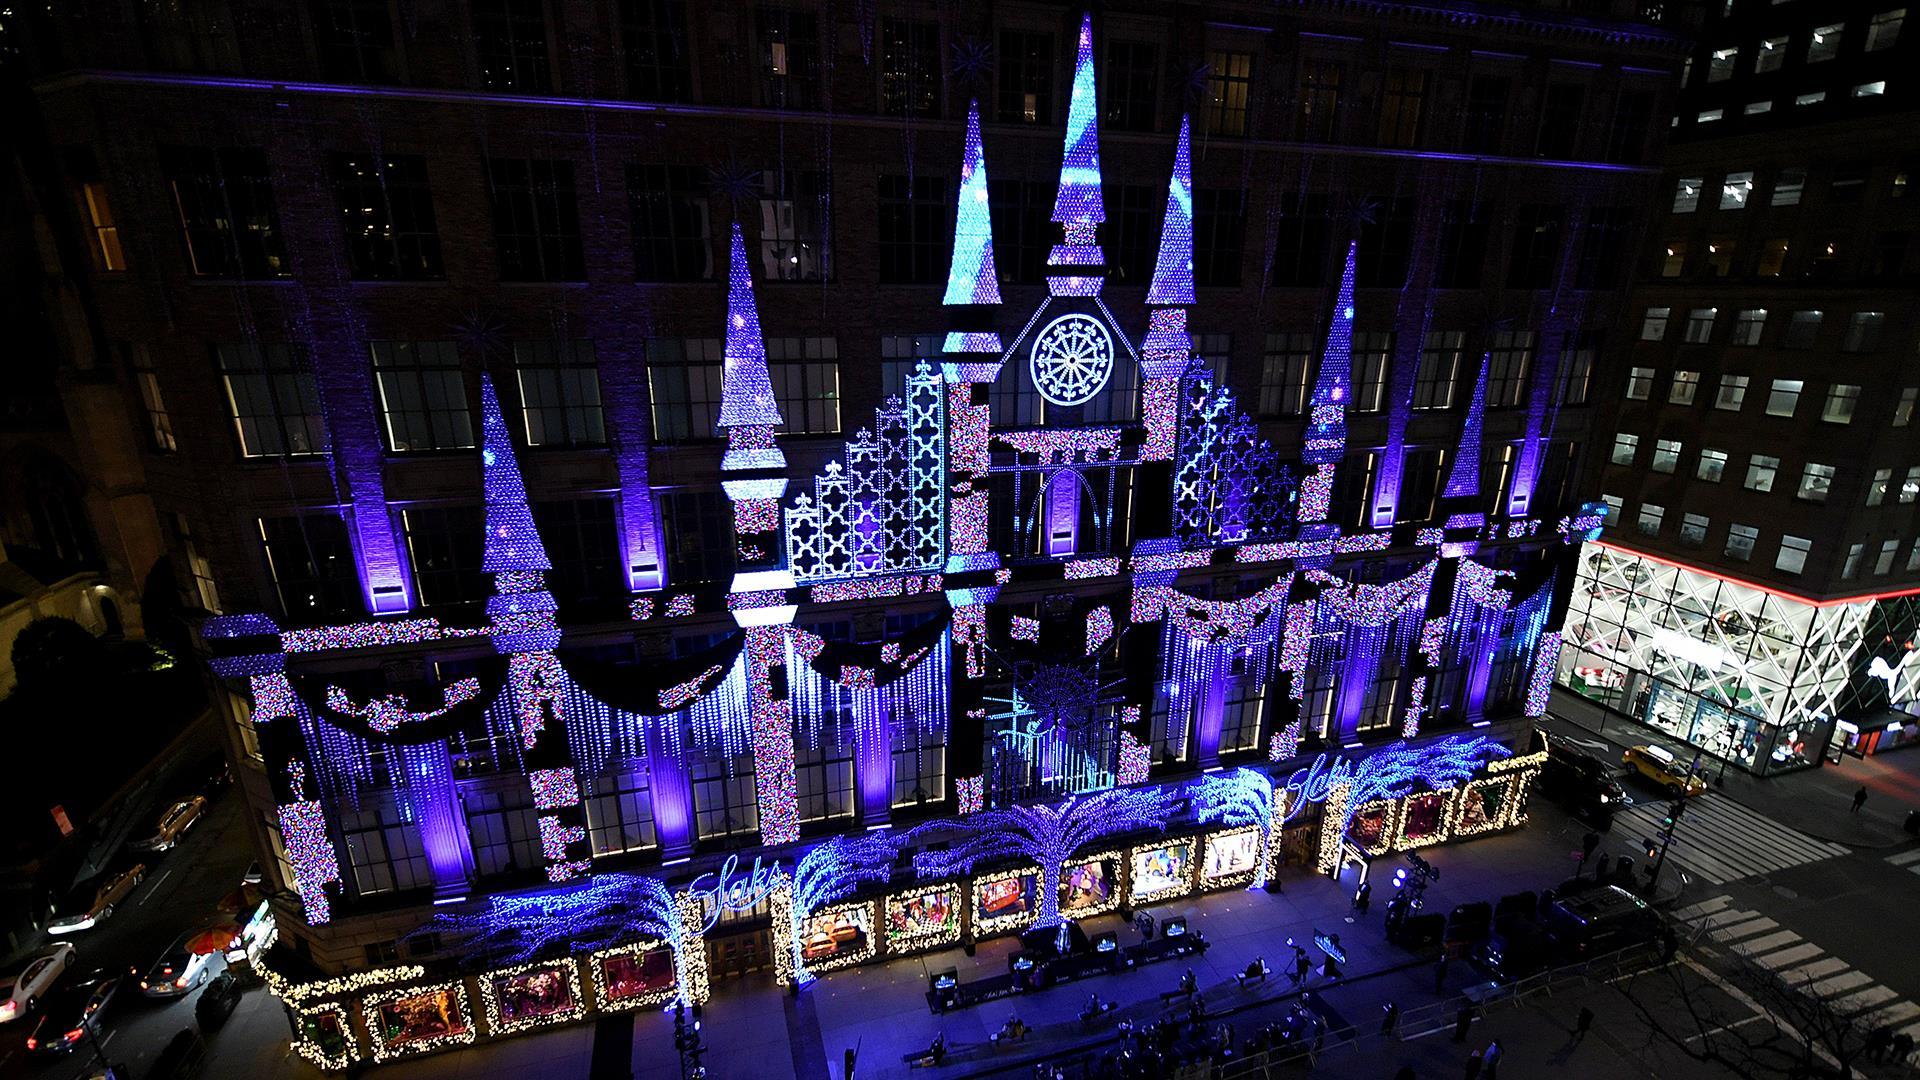 Saks Fifth Avenue Christmas Light Show 2021 Watch Saks Fifth Avenue Unveils Annual Holiday Light Show